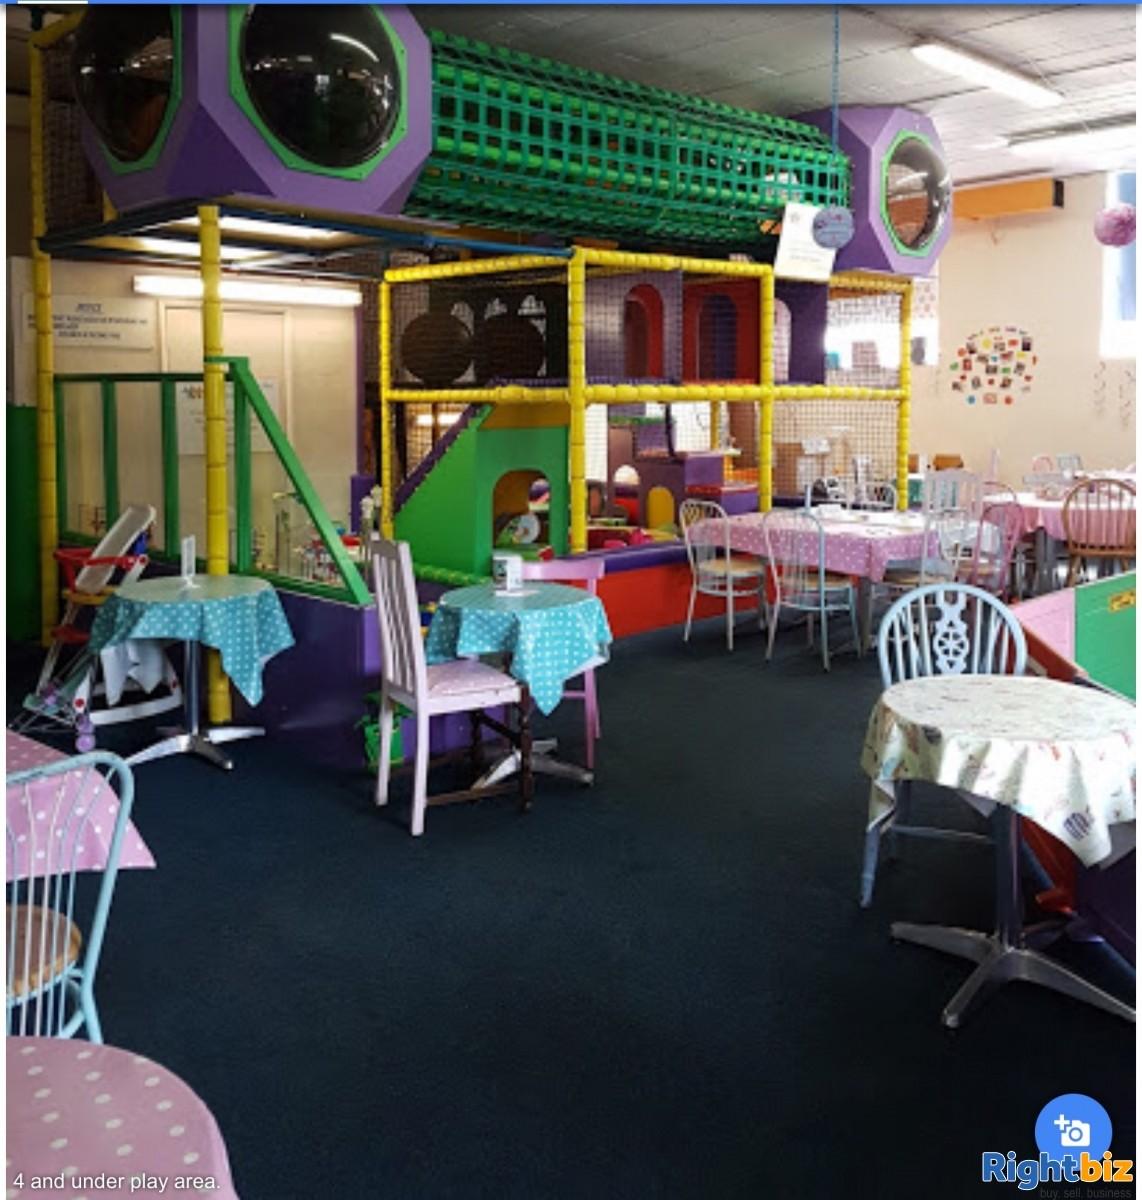 OFSTED REGISTERED CHILDCARE PROVIDER - Image 4